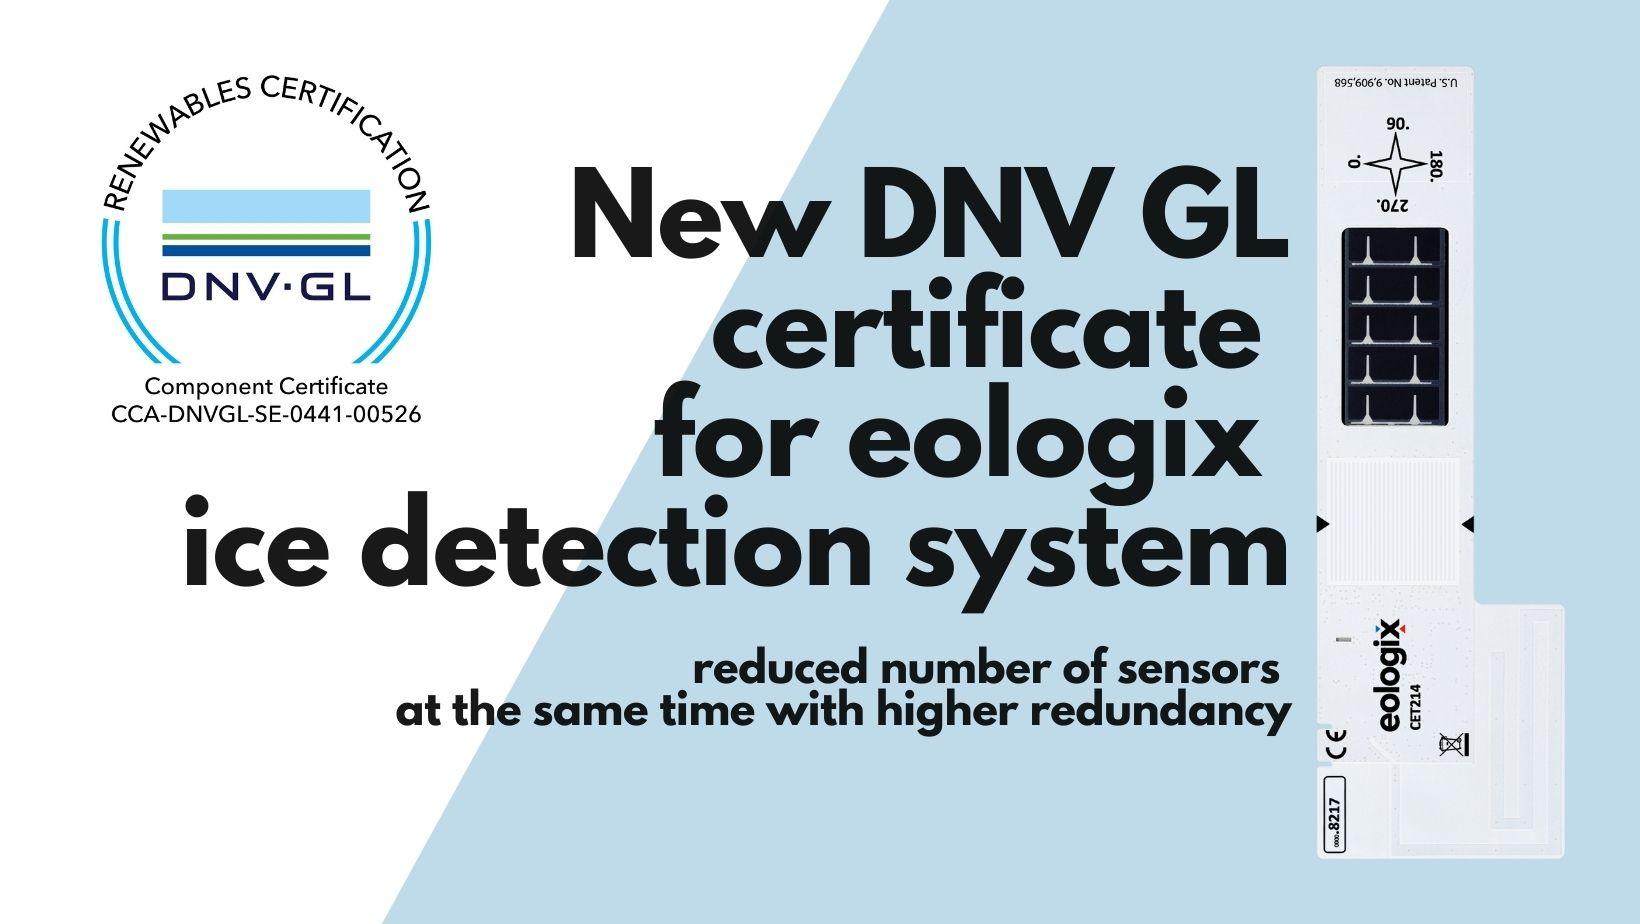 new DNV GL certificate